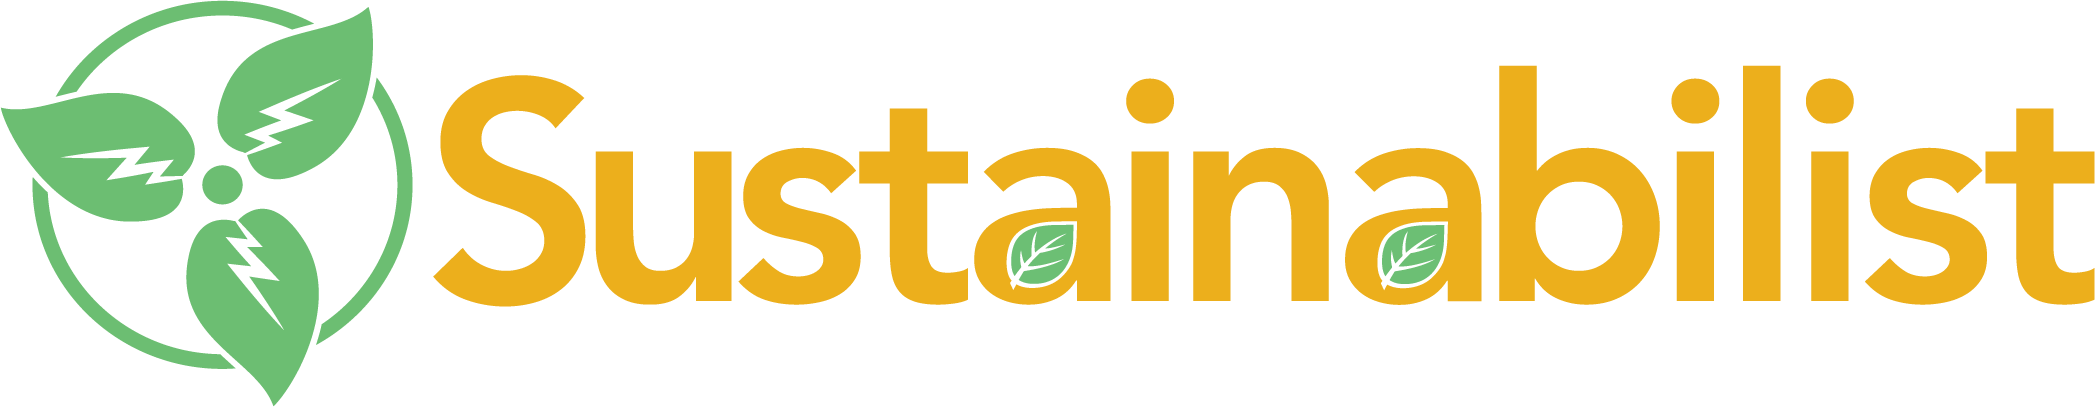 Sustainabilist Logo